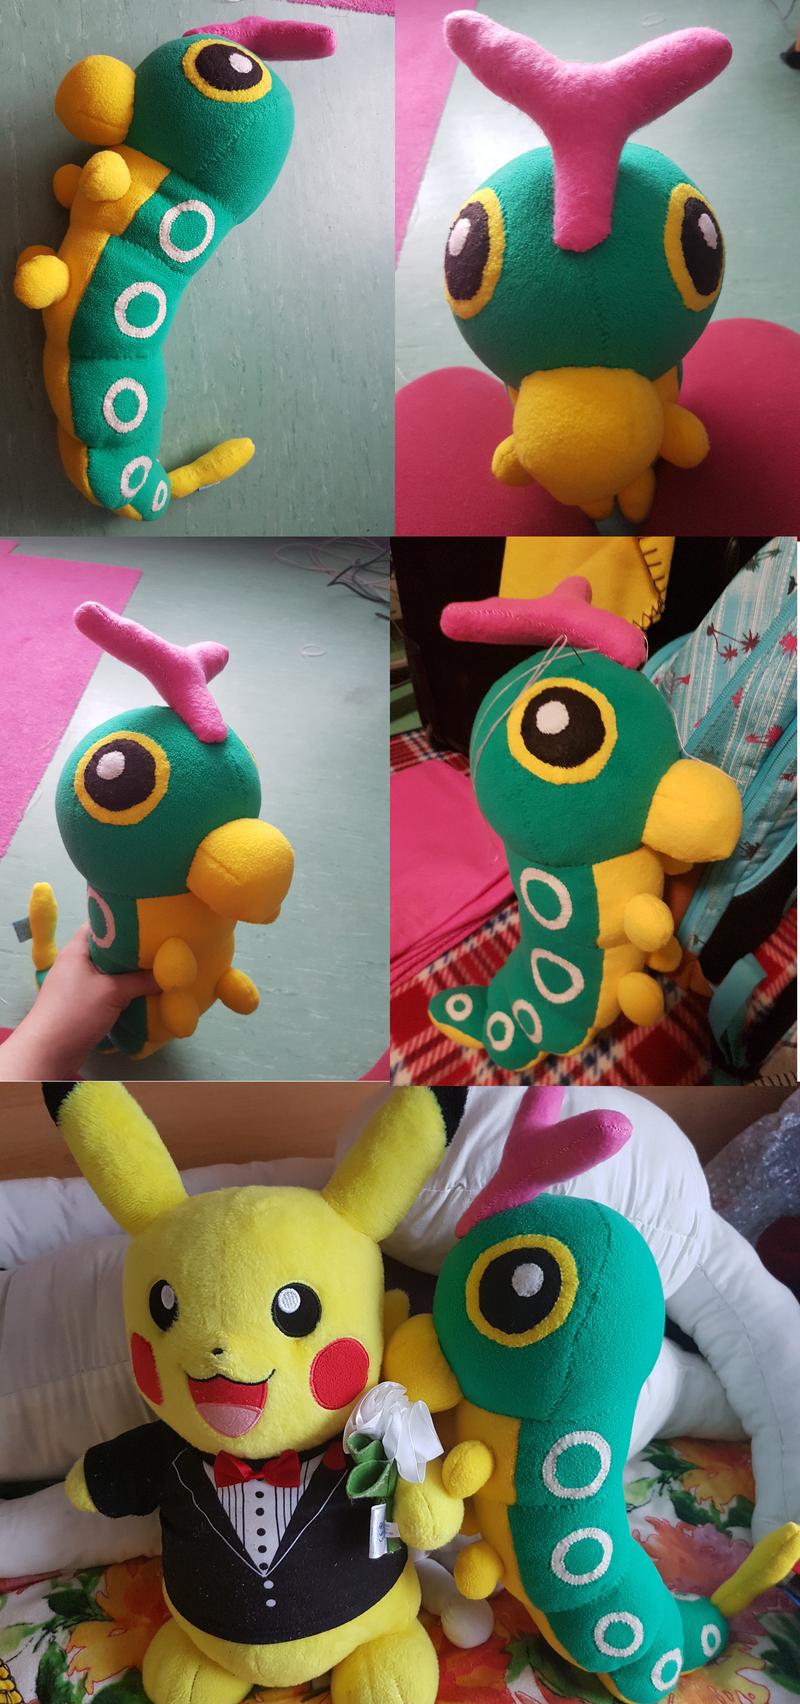 Pokemon Caterpie Plush Images